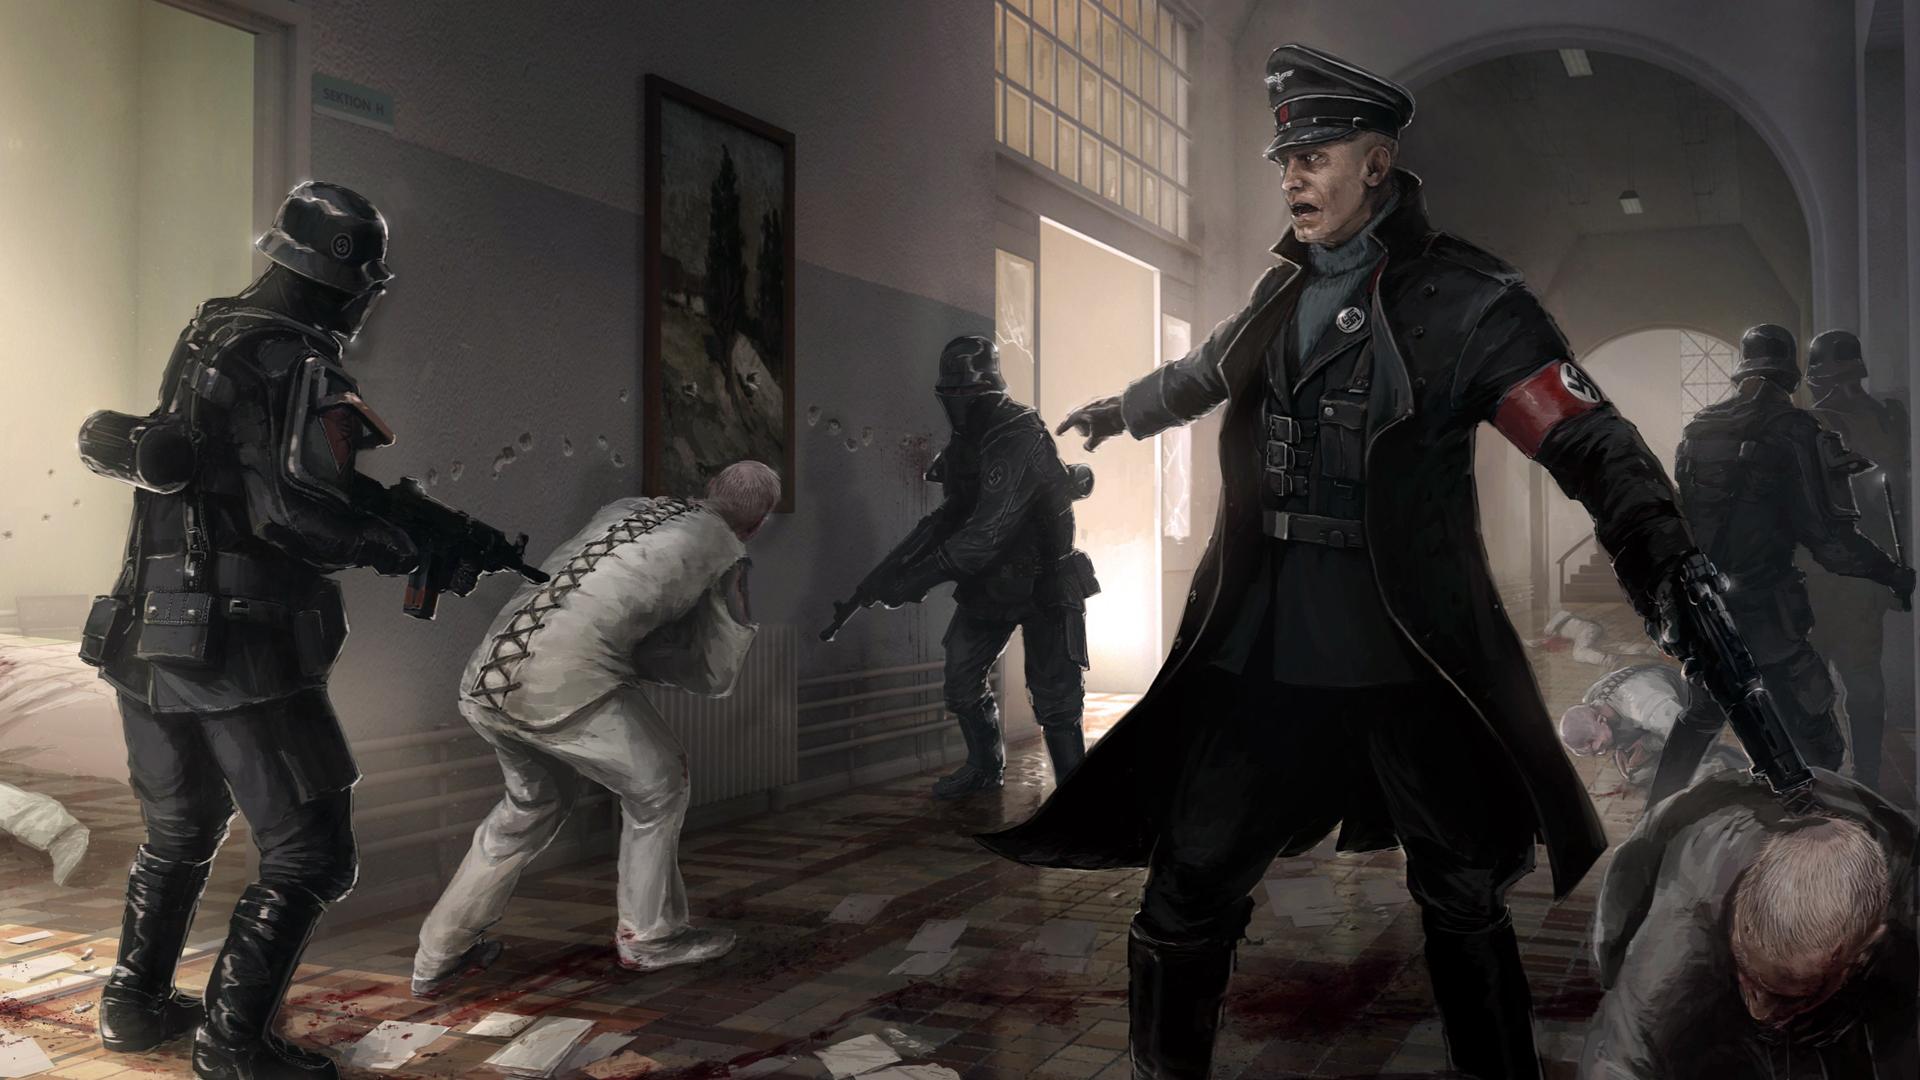 wolfenstein the new order 8v wallpaper hd